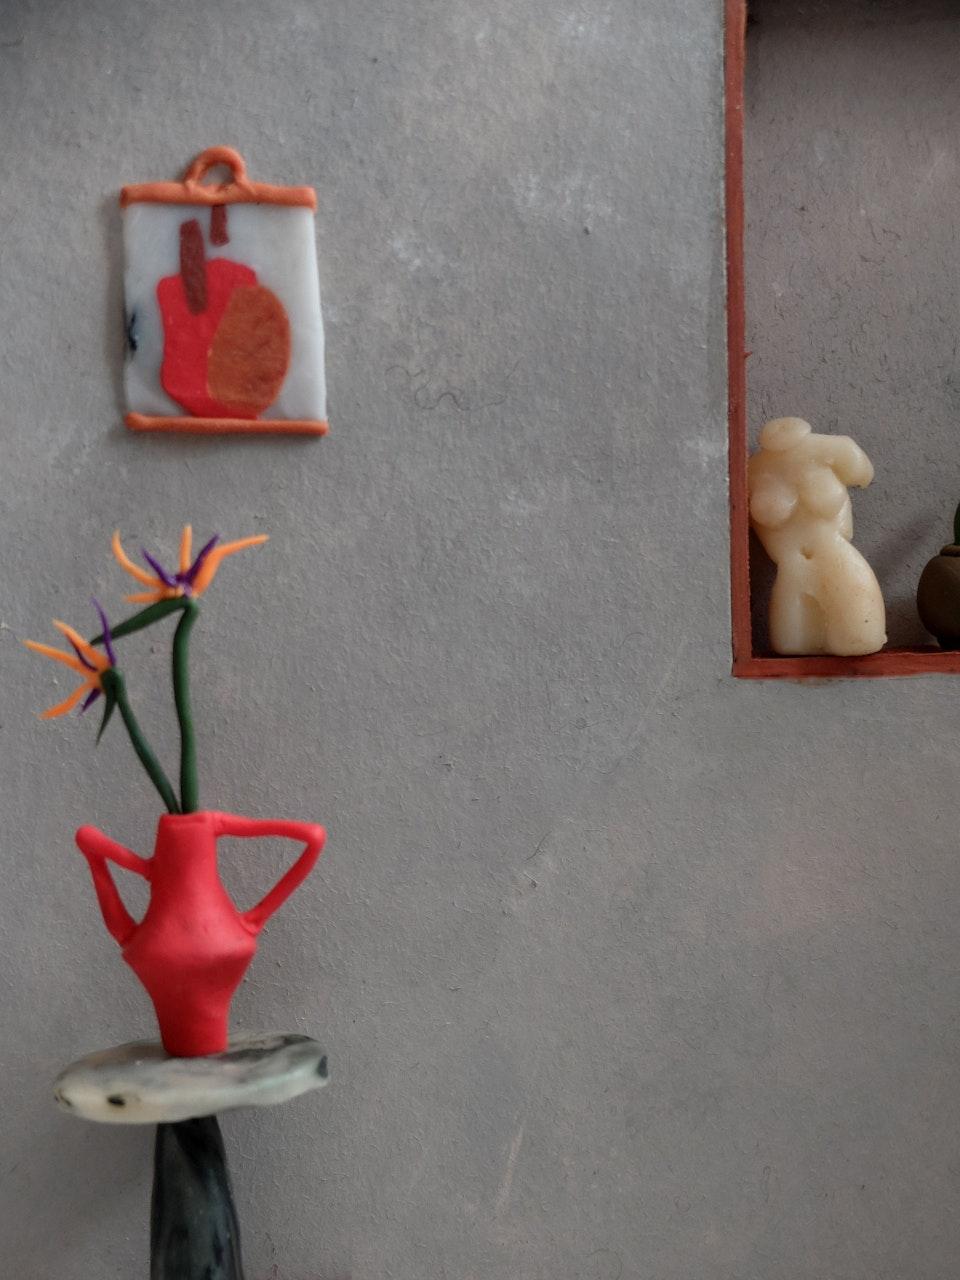 Production Designer: Phoebe Anne Harris: 'Teeny Tiny House of Clay' - DSCF8781